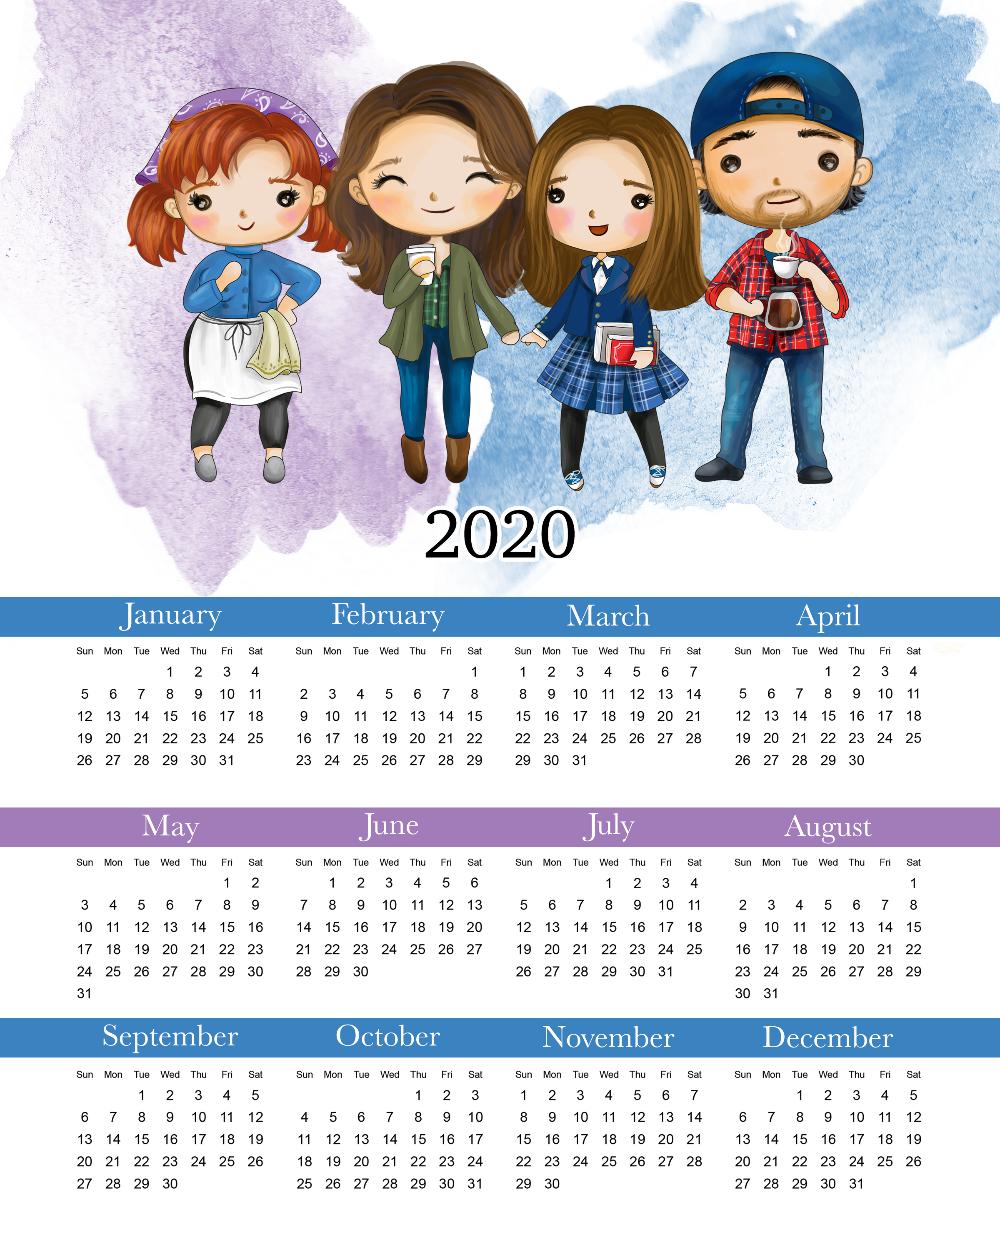 Free Printable 2020 Gilmore Girls Calendar in 2020